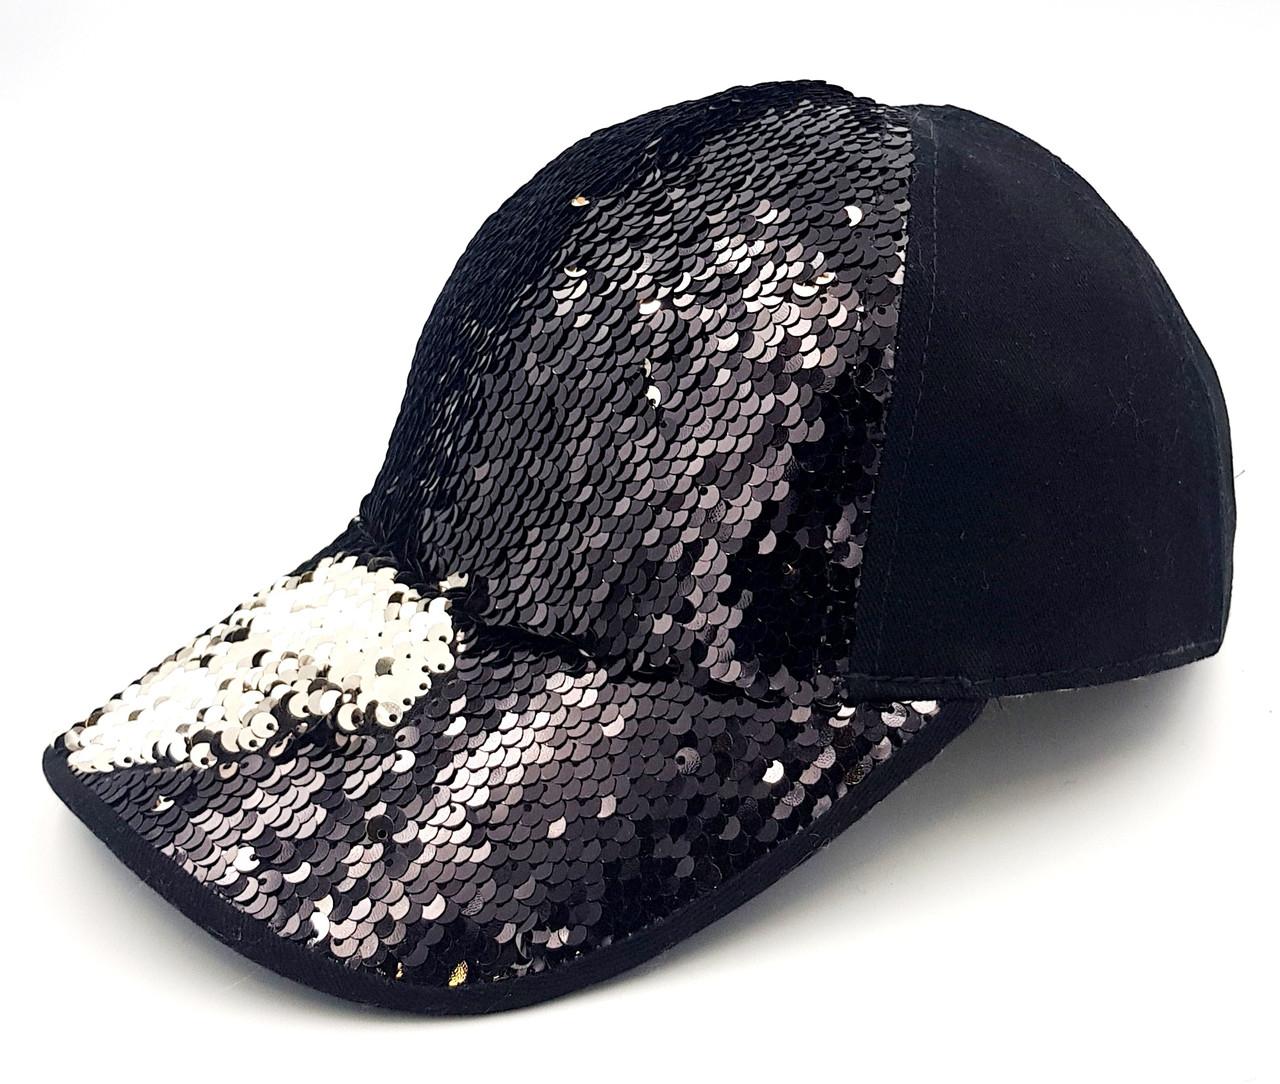 Женская бейсболка Klaus  Пайетки Коттон Чёрный One size -Демисезон (038-П)